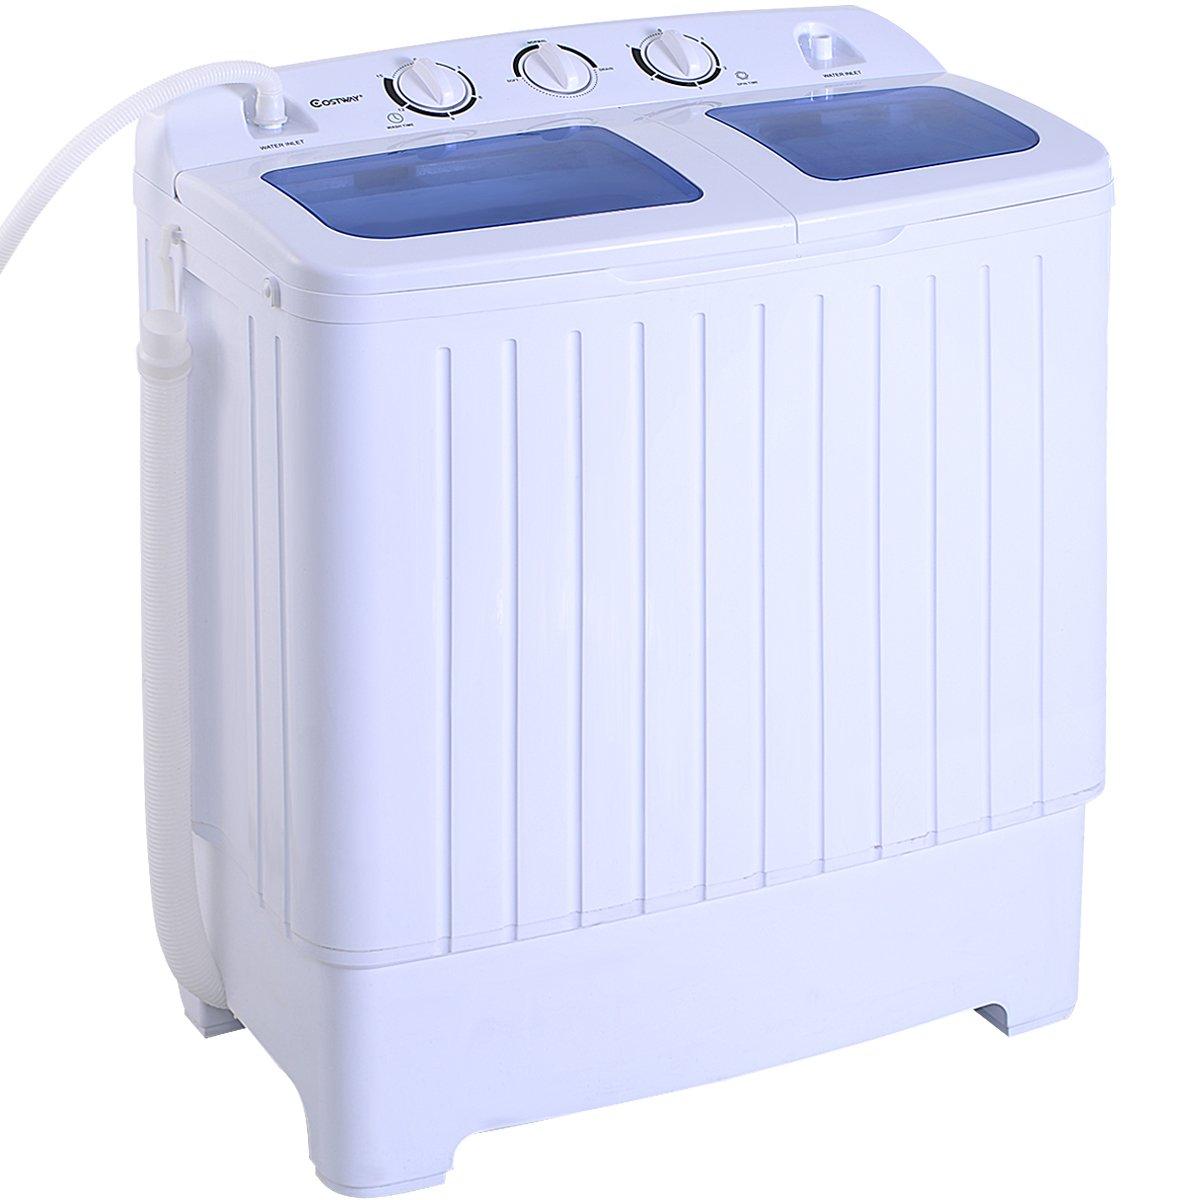 Giantex Portable Mini Compact Twin Tub 17.6lbs Washing Machine Washer Spin Cycle